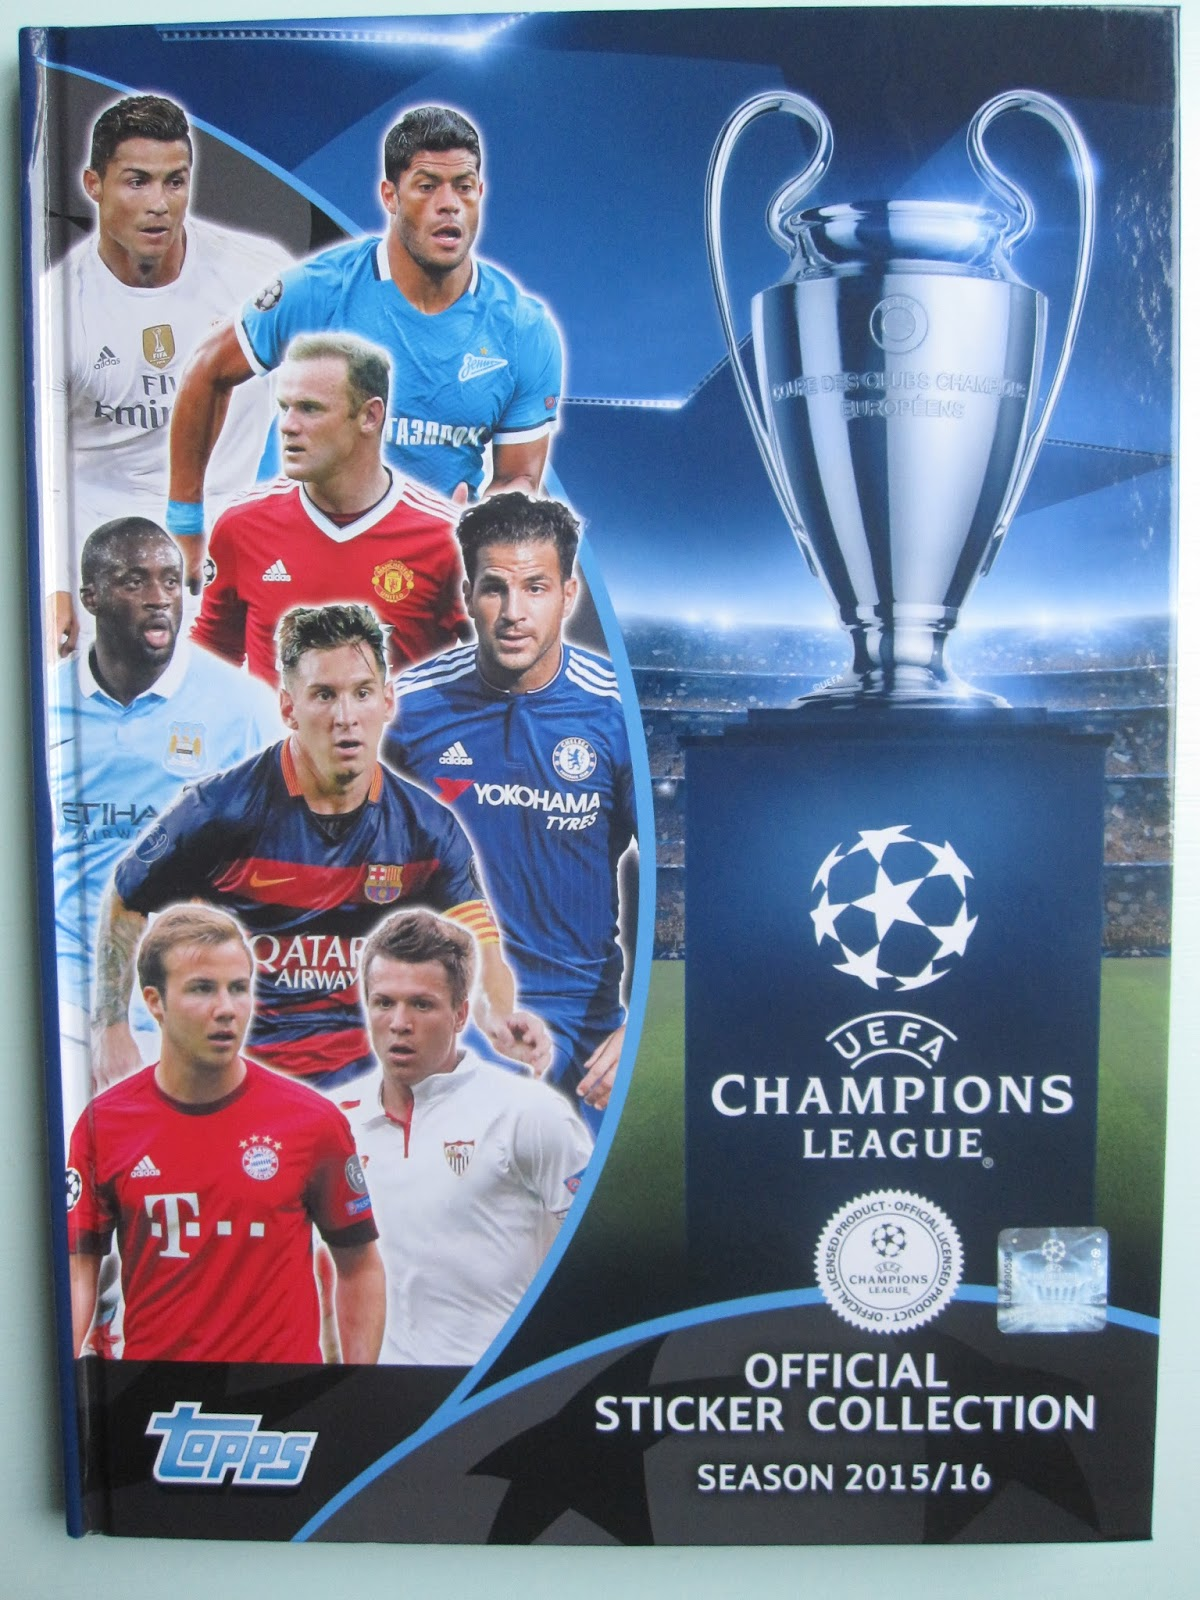 Champions Leguea